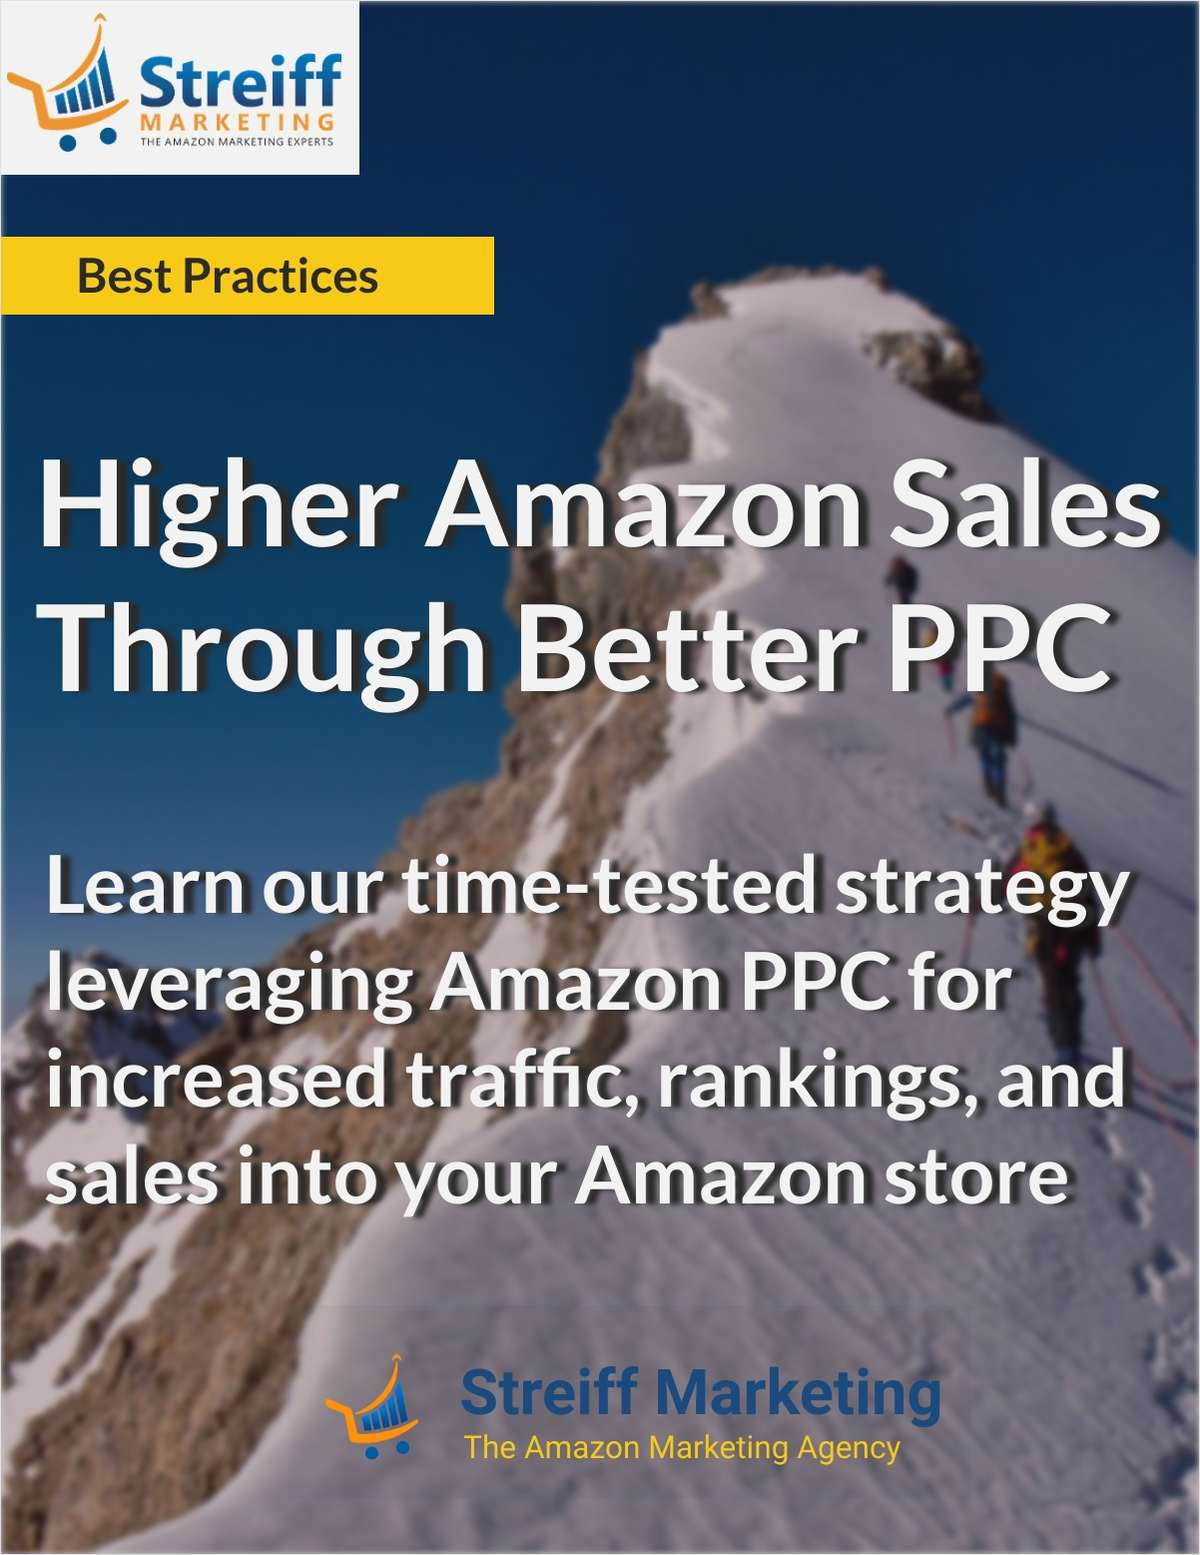 Higher Amazon Sales Through Better PPC